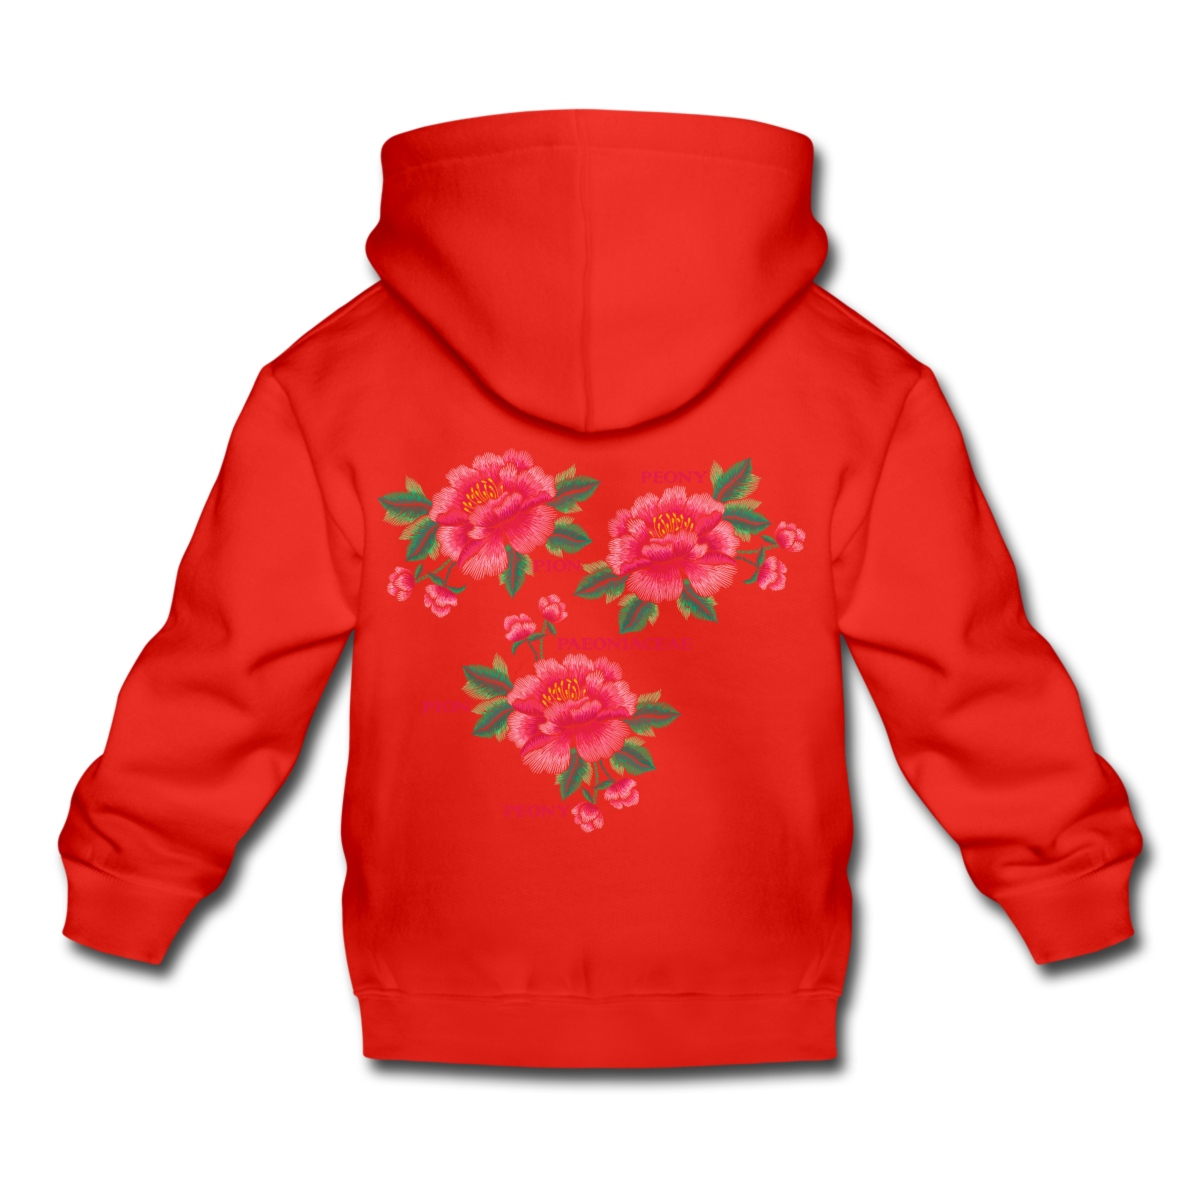 pion-premium-luvtroeja-barn-röd.jpg